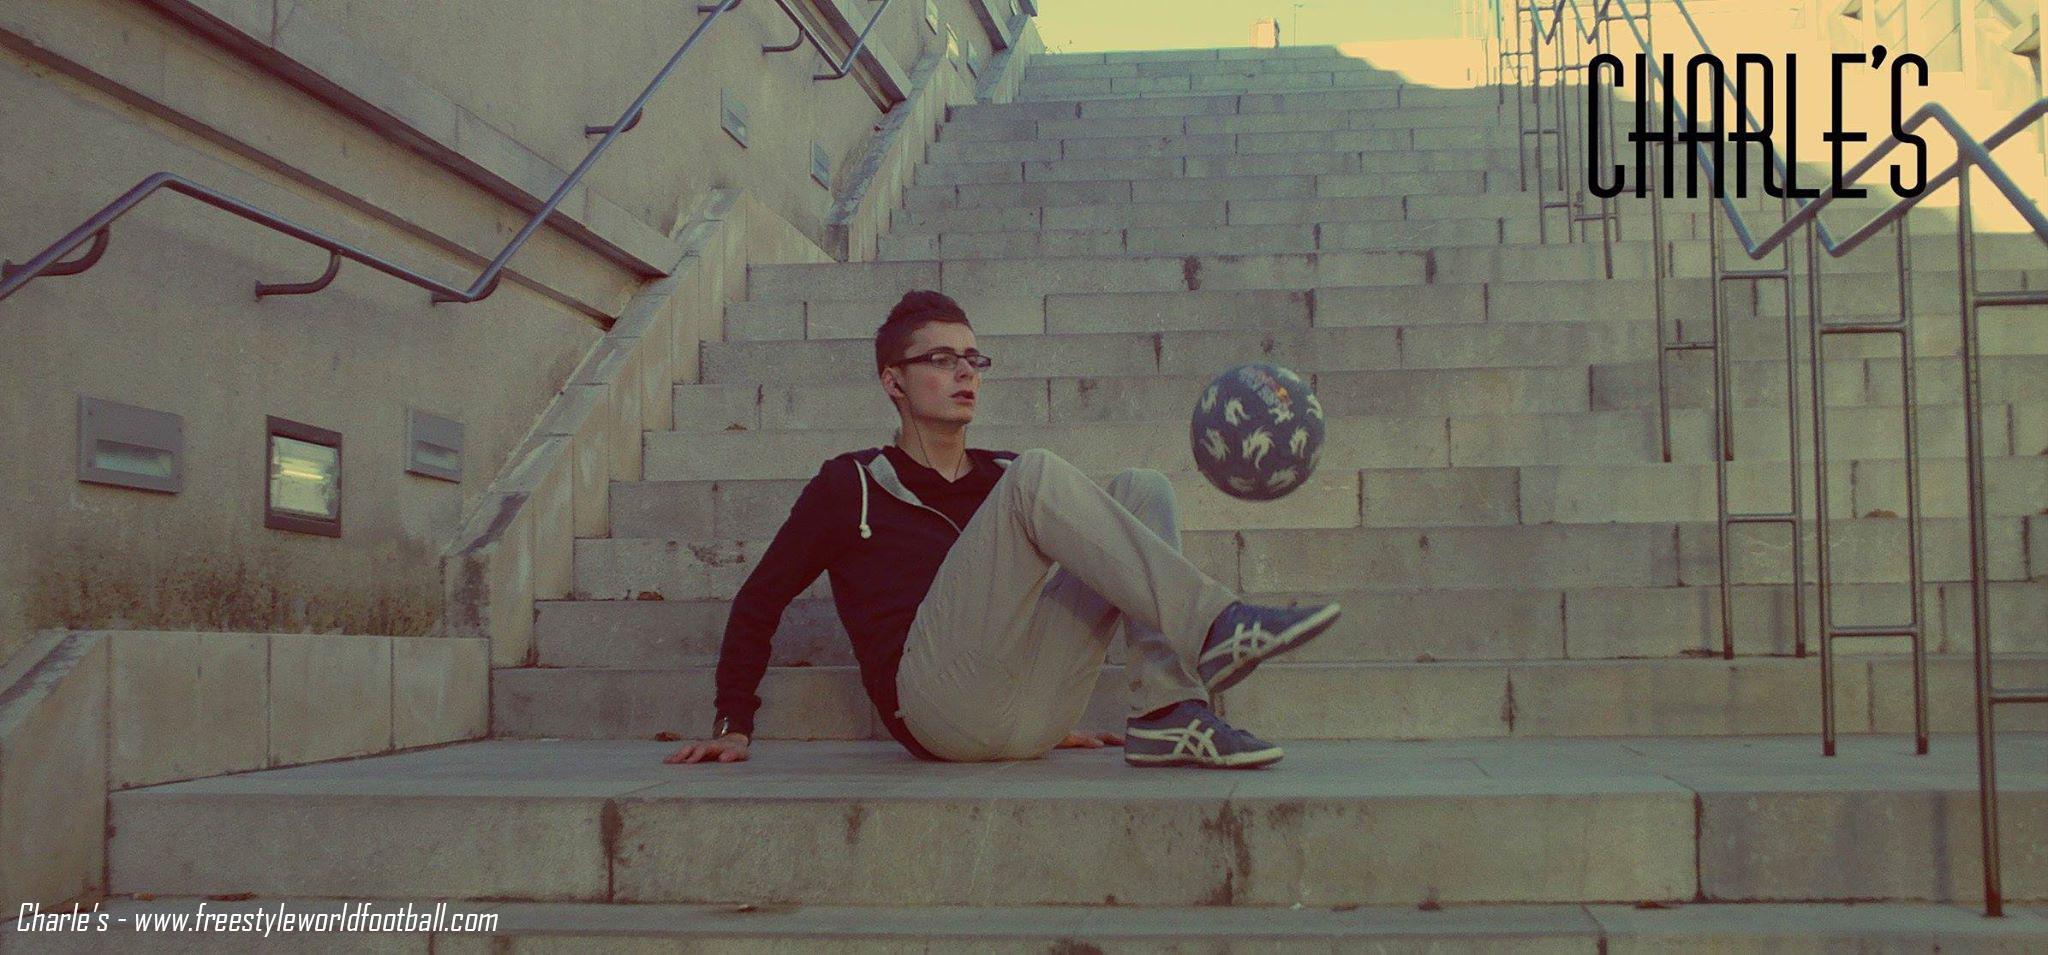 charles - 001 - www.freestyleworldfootball.com.jpg